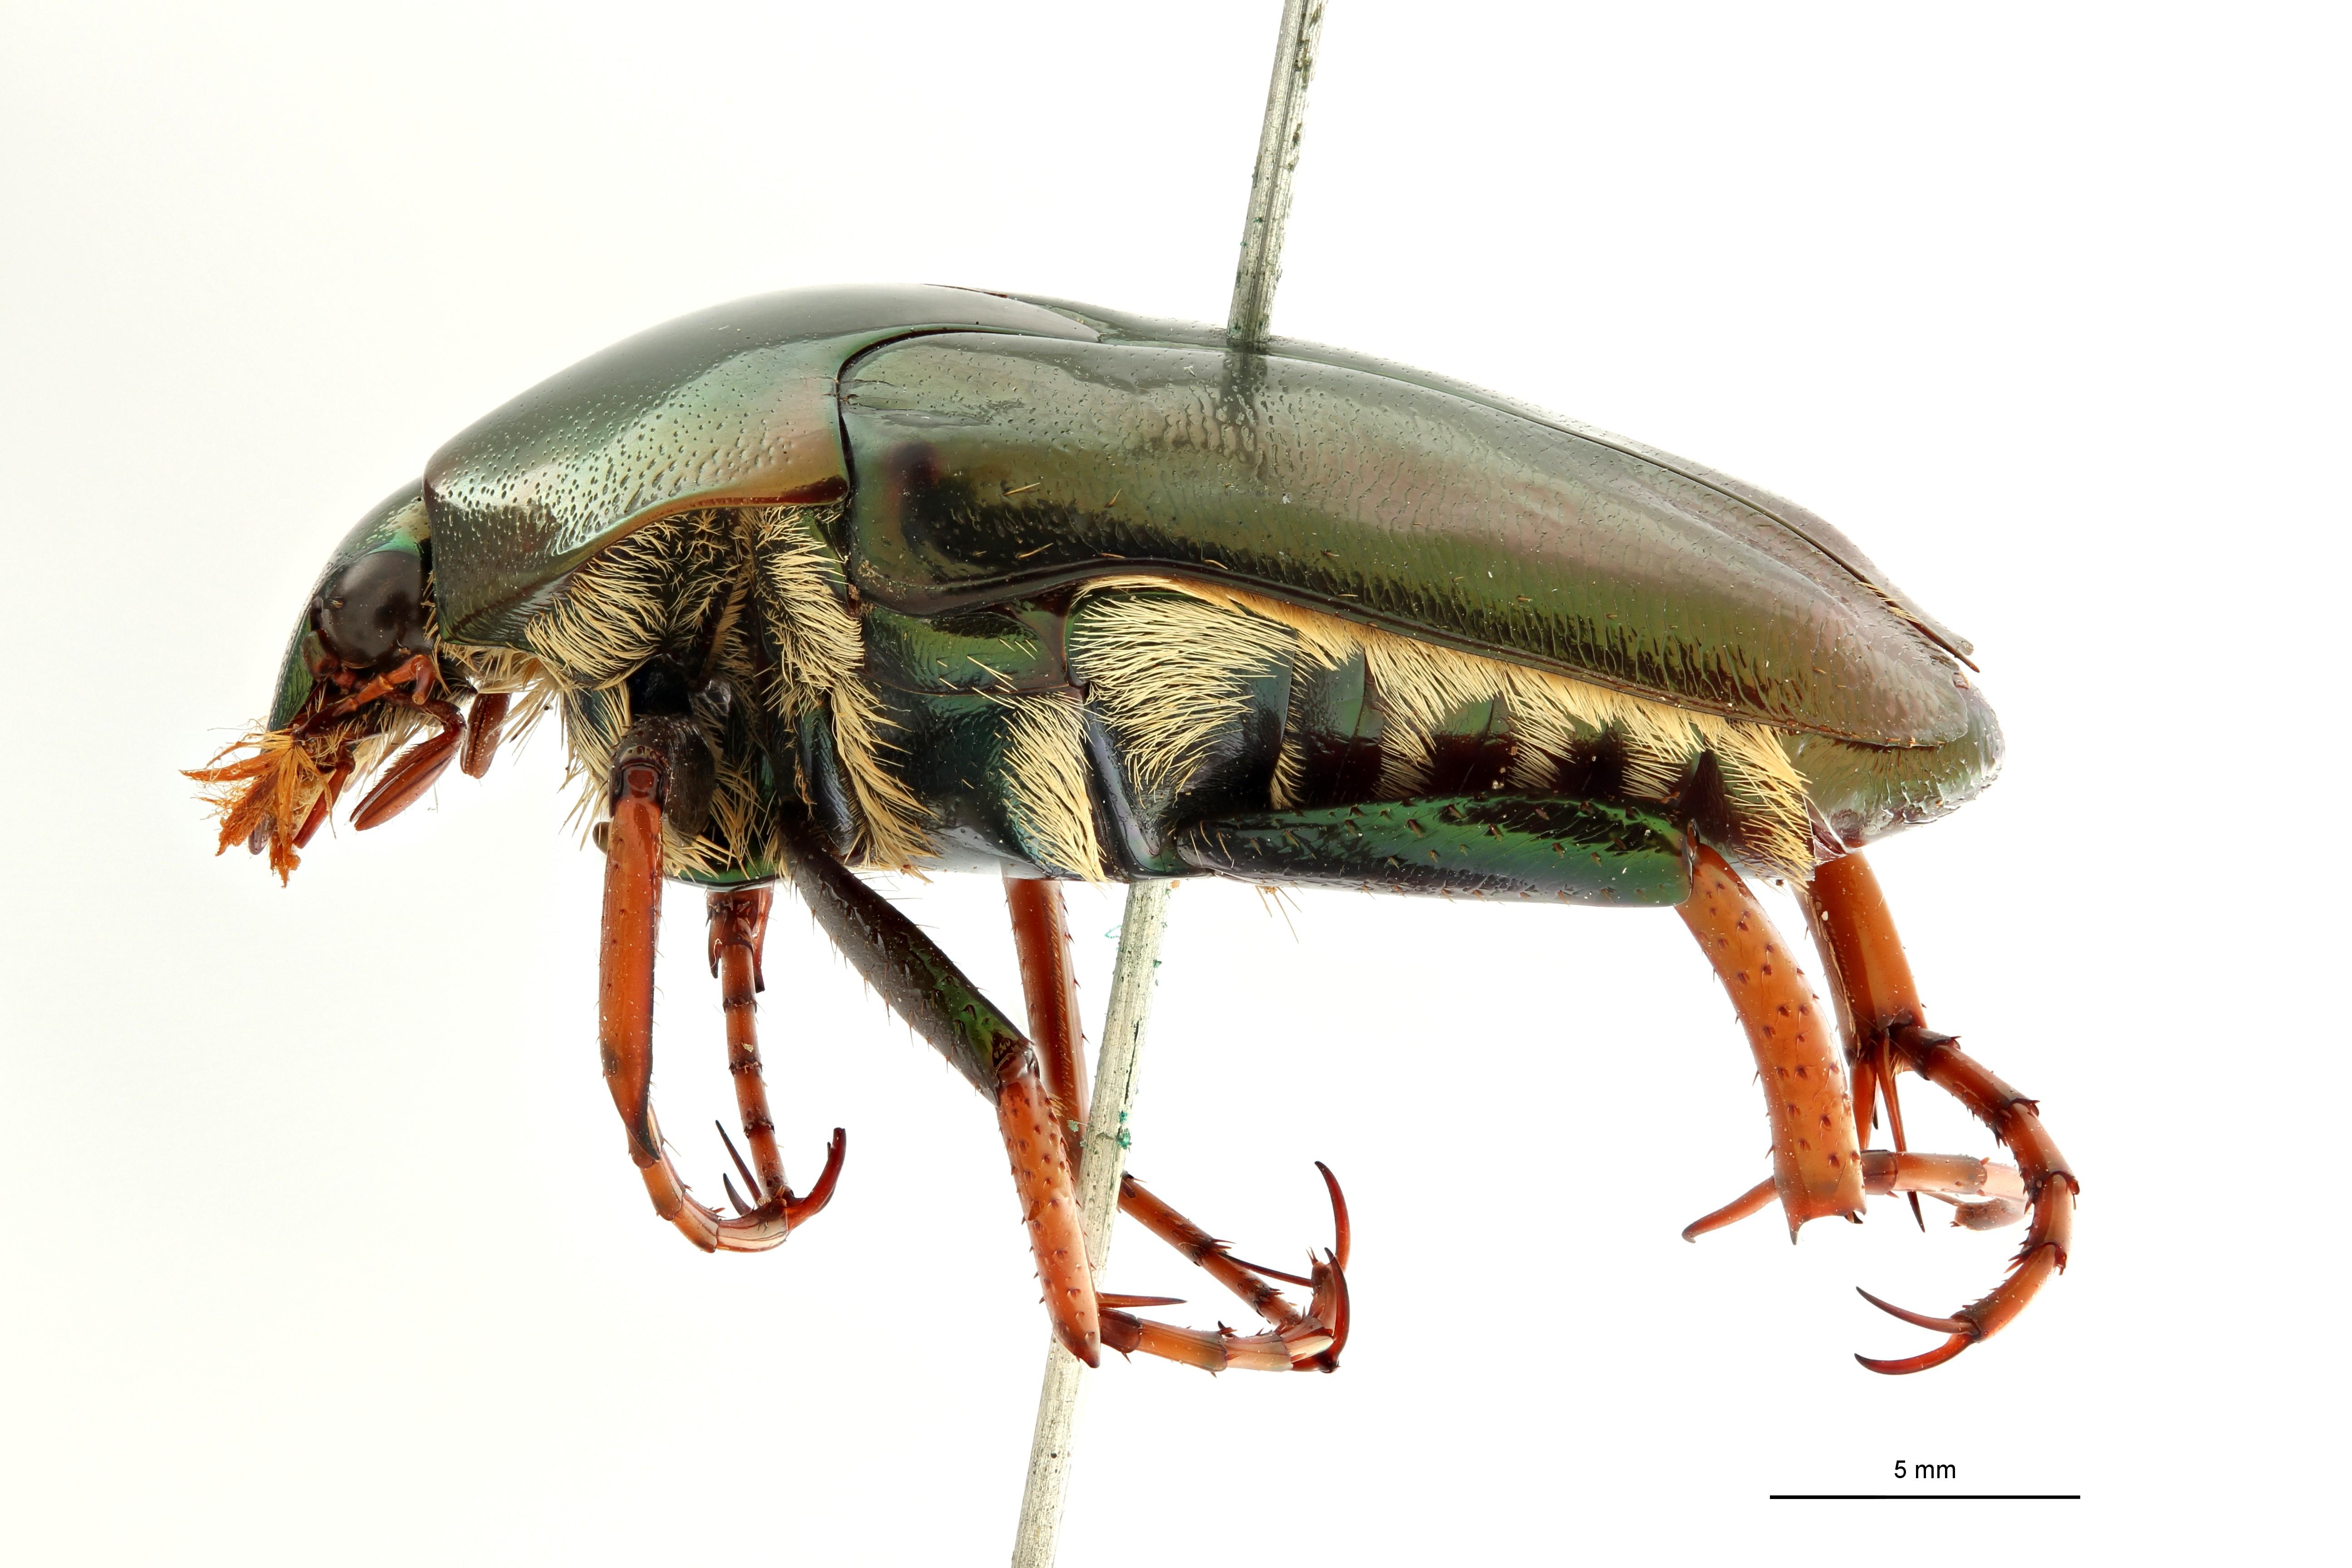 Mycterophallus validipes t L ZS PMax Scaled.jpeg